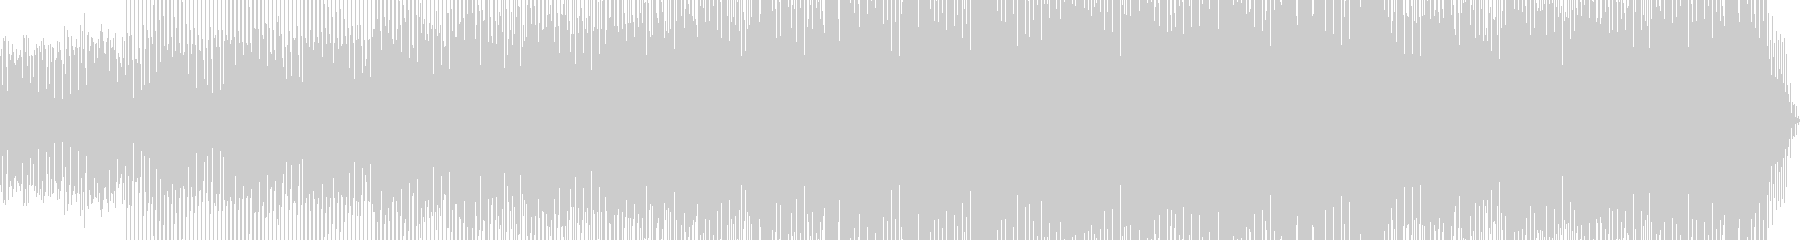 AcidHouseの決定版!の未再生の波形